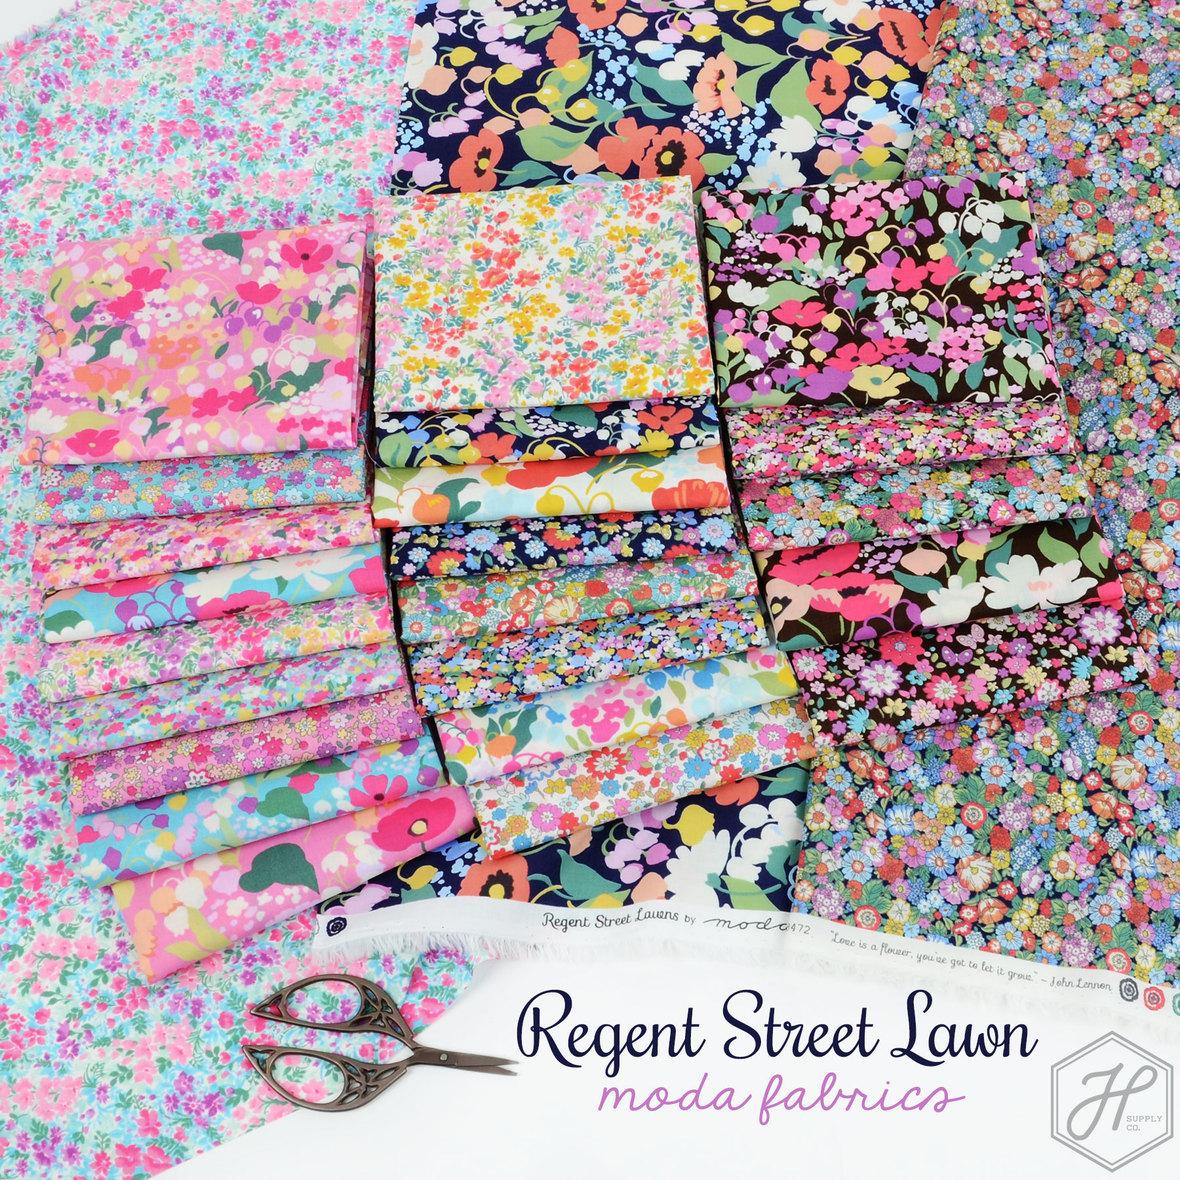 Regent-Street-Lawn-Moda-at-Hawthorne-Supply-Co